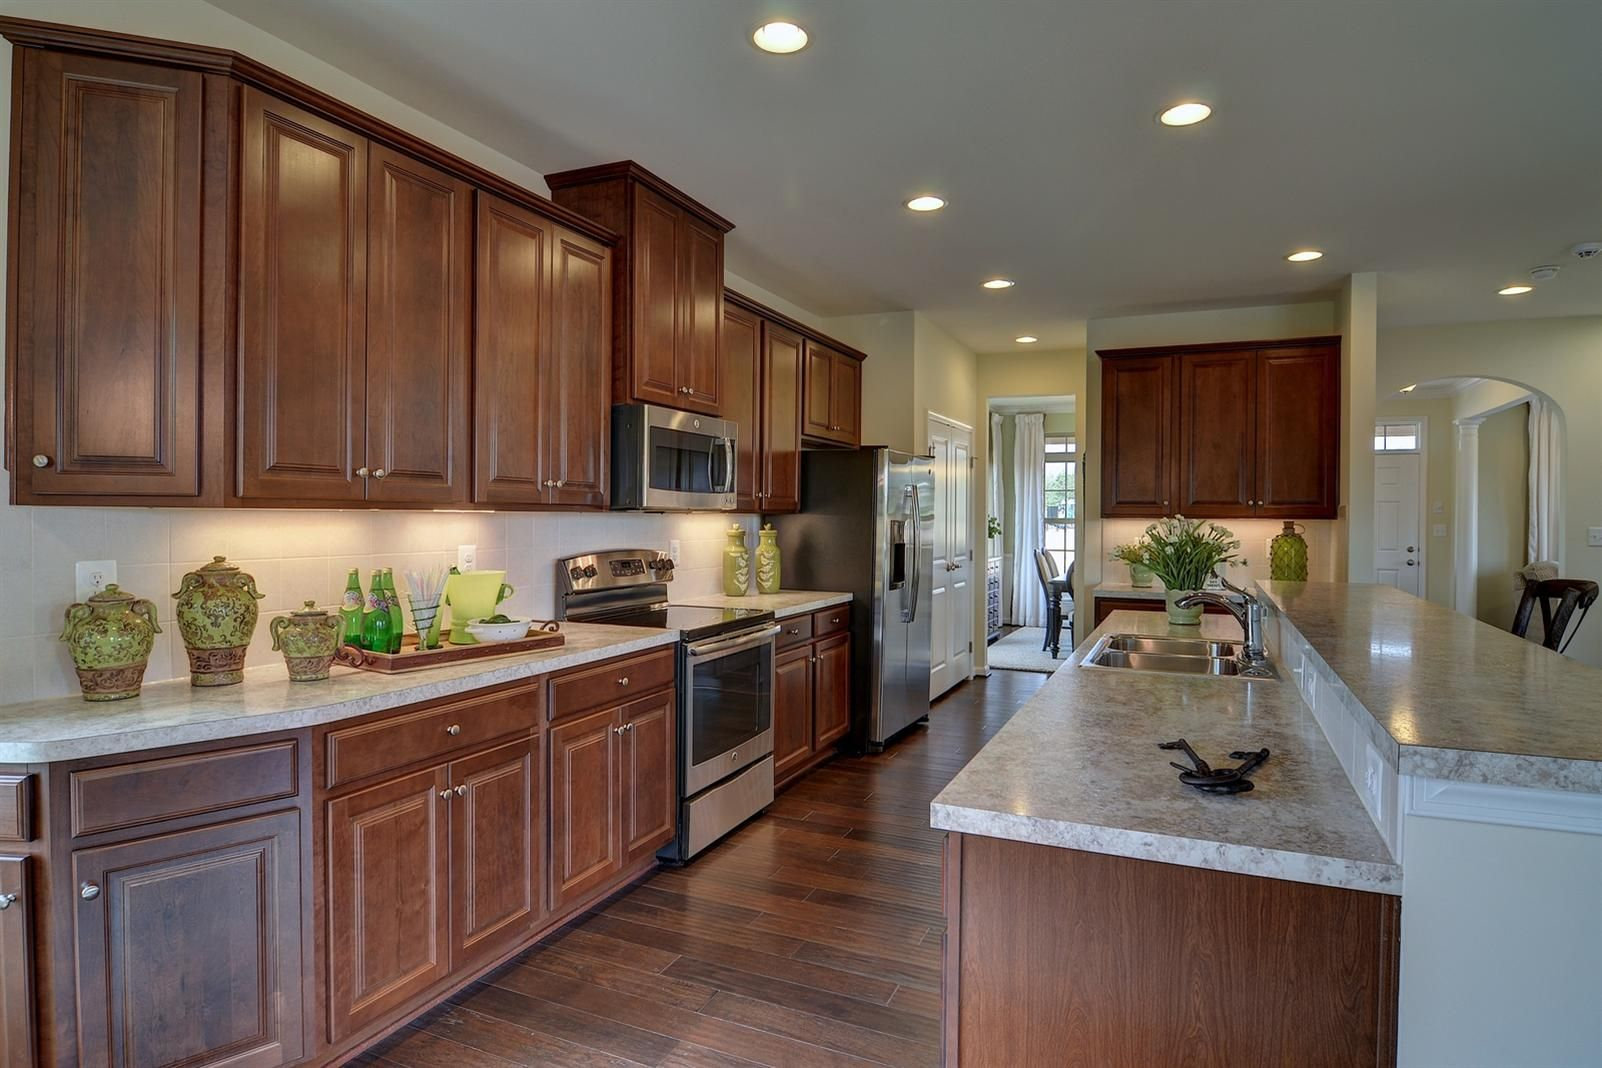 New John Steinbeck Home Model For Sale Nvhomes Home Kitchens